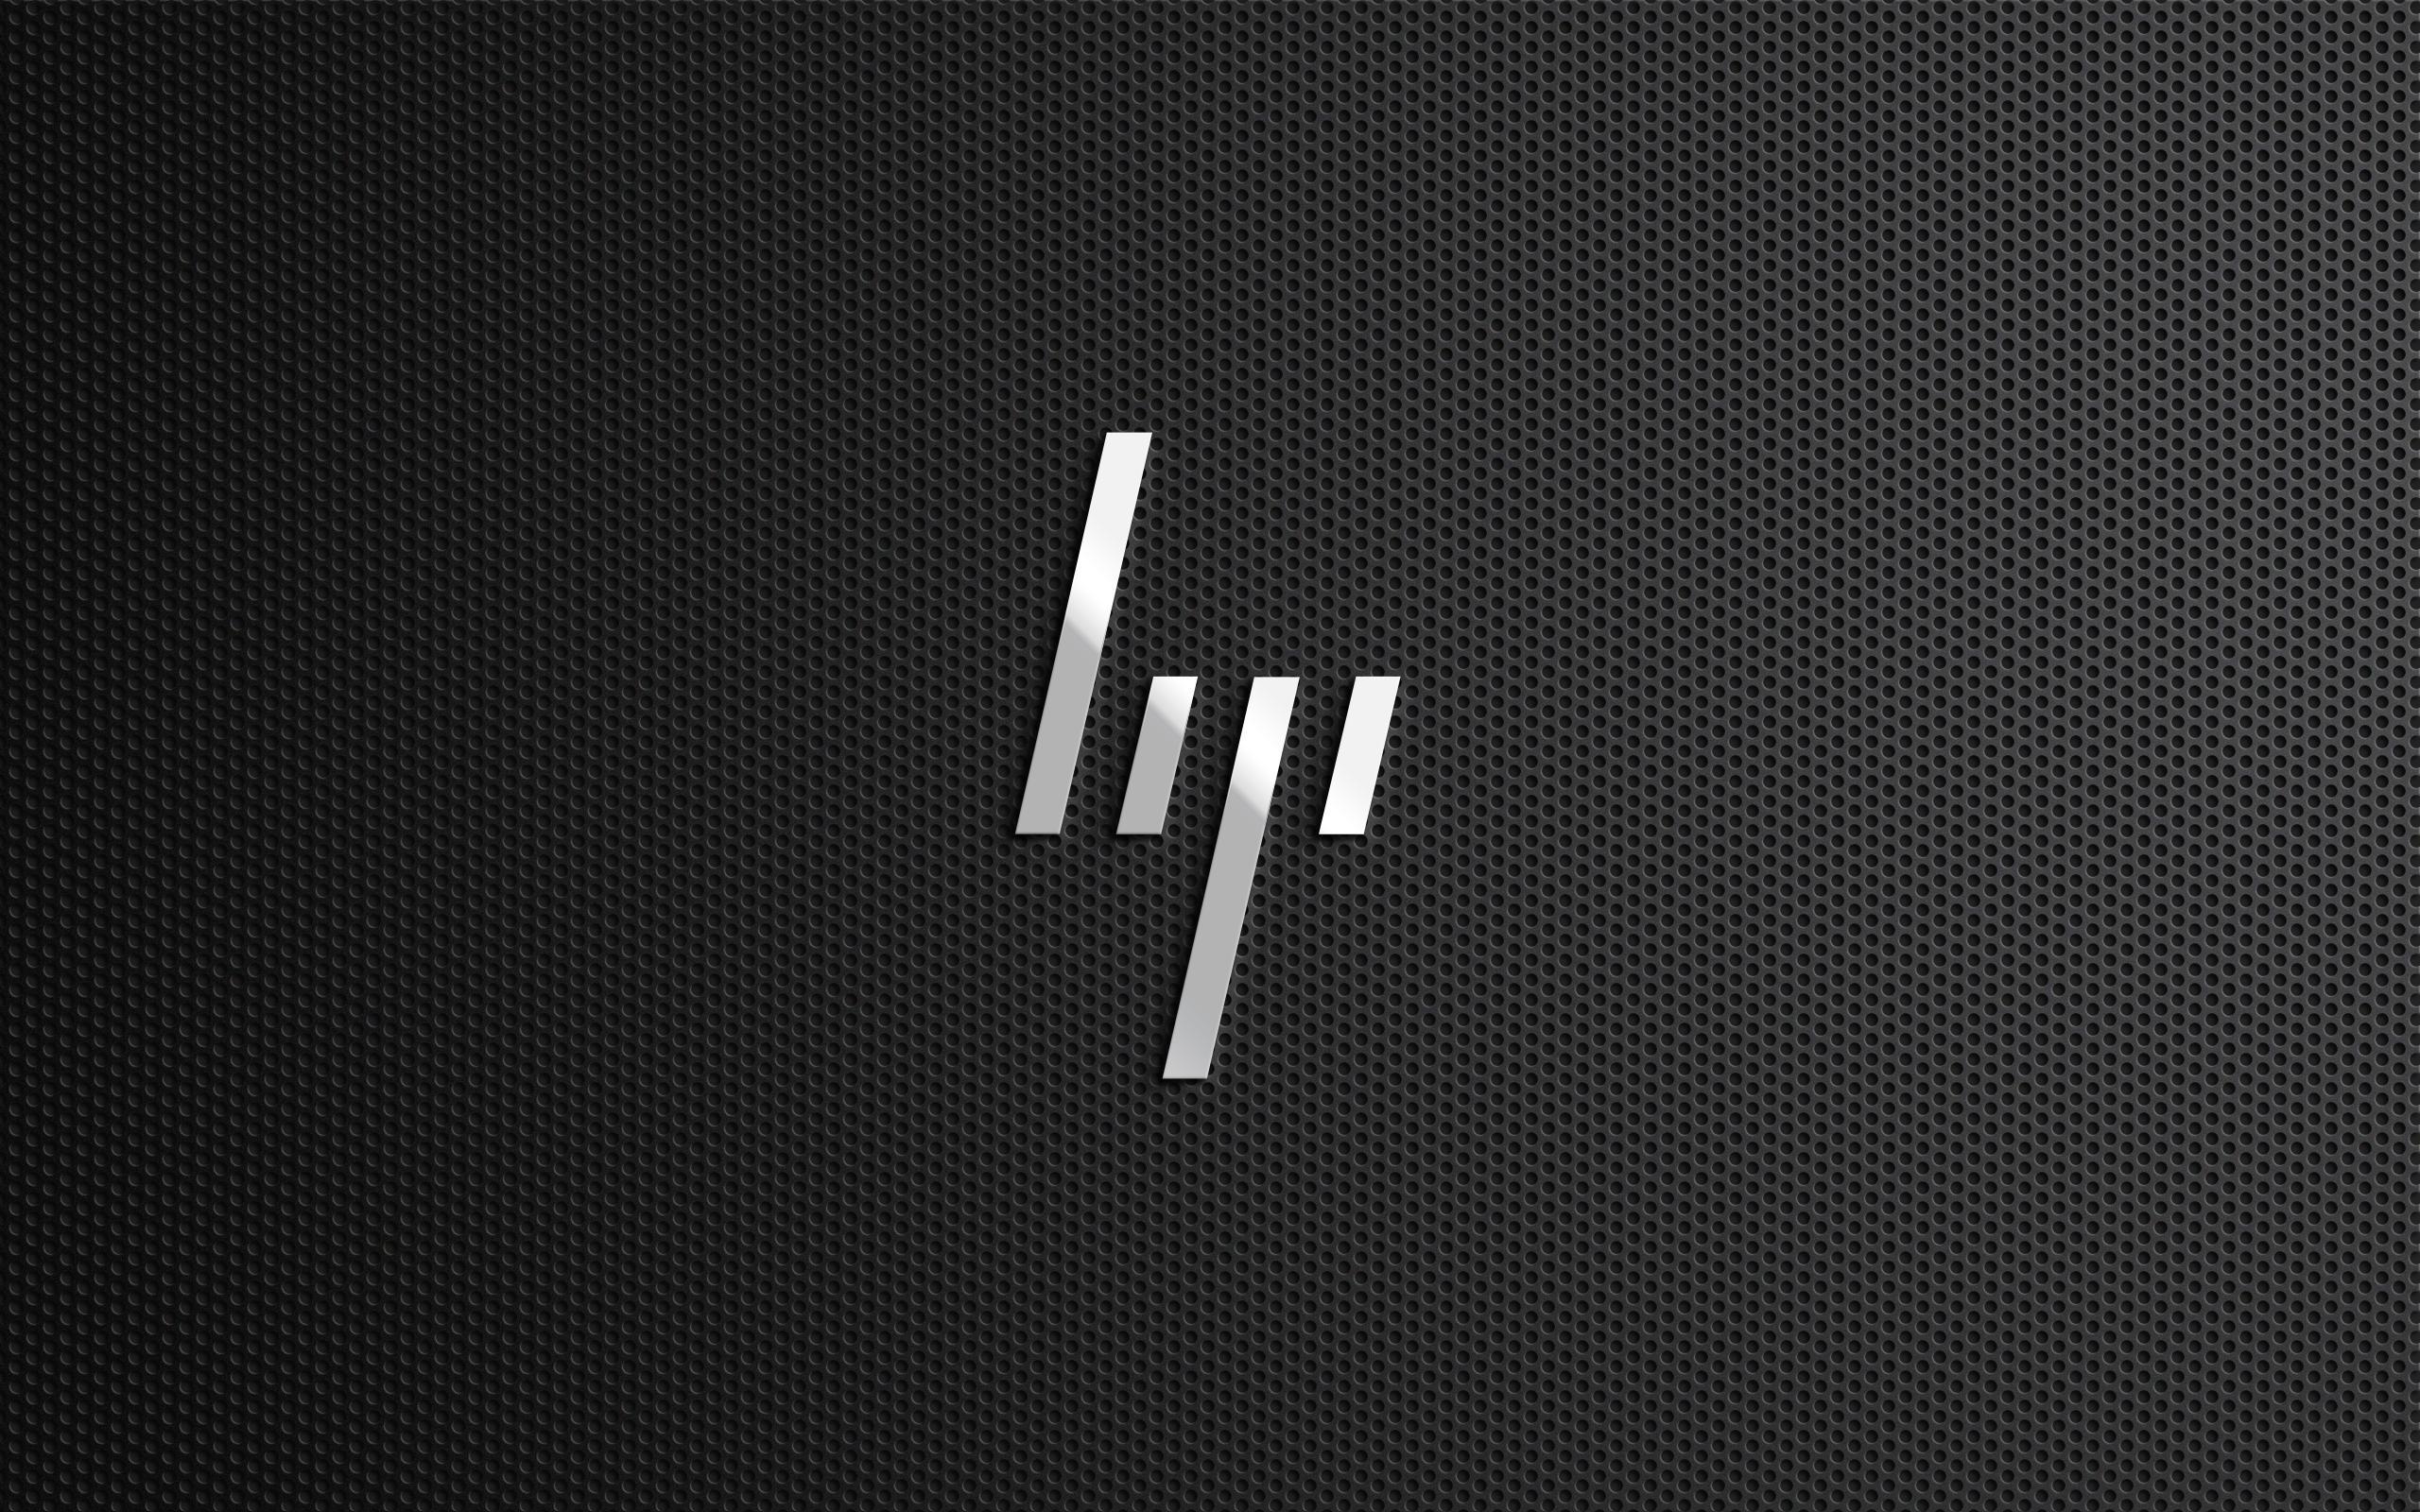 cool hp logo wallpaper - photo #22